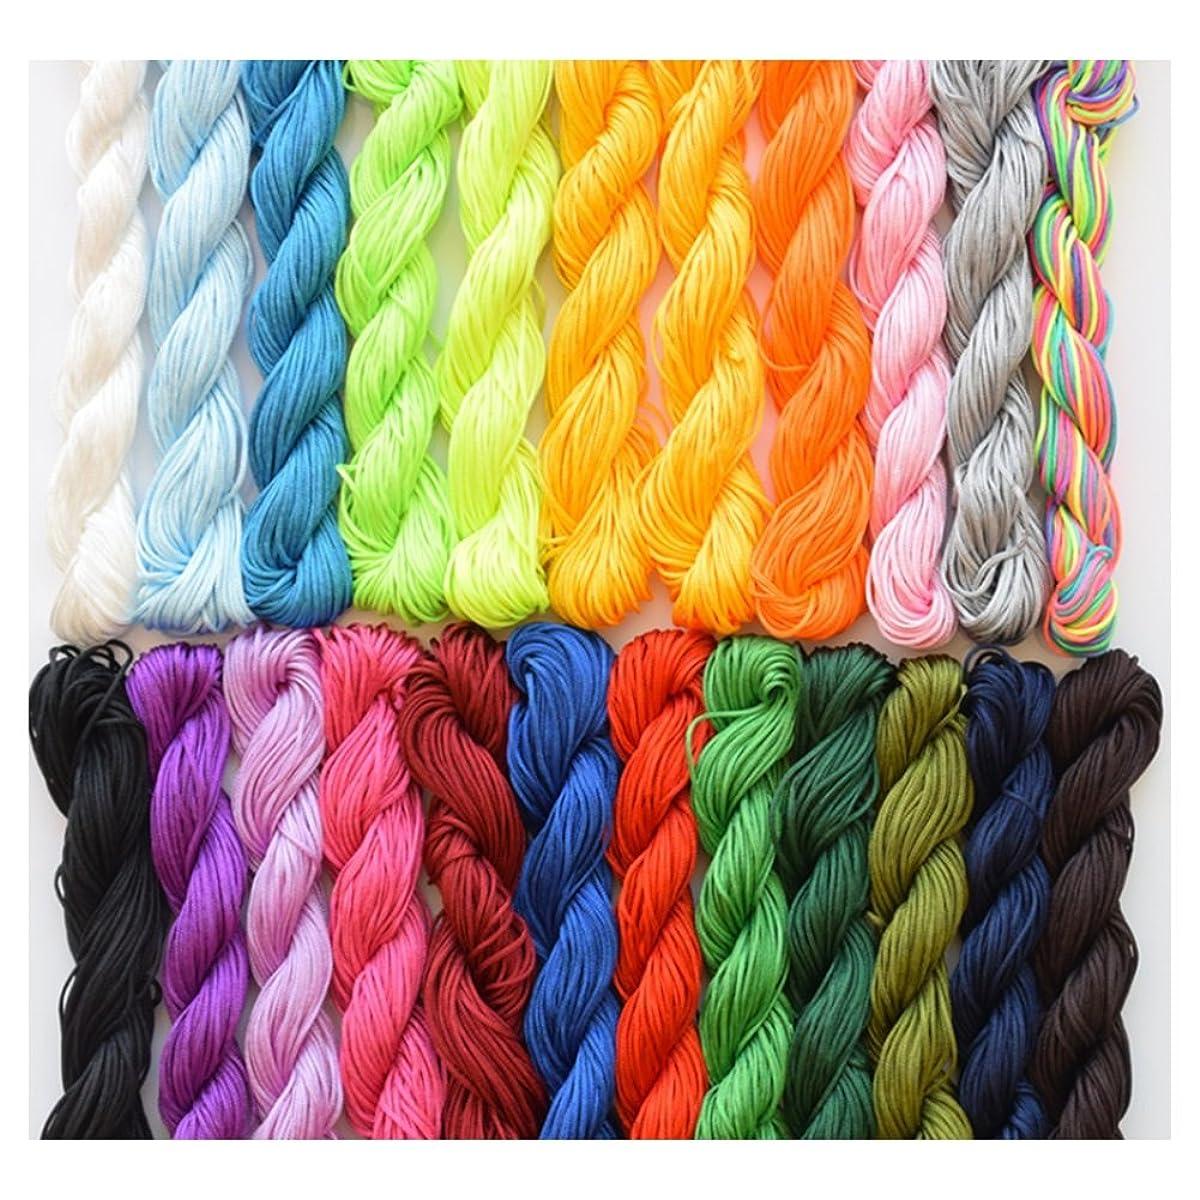 Hand Knit Cord 1mm Nylon Macrame Chinese Knotting Cord Shamballa Ratail Bracelet Thread String 20PCS